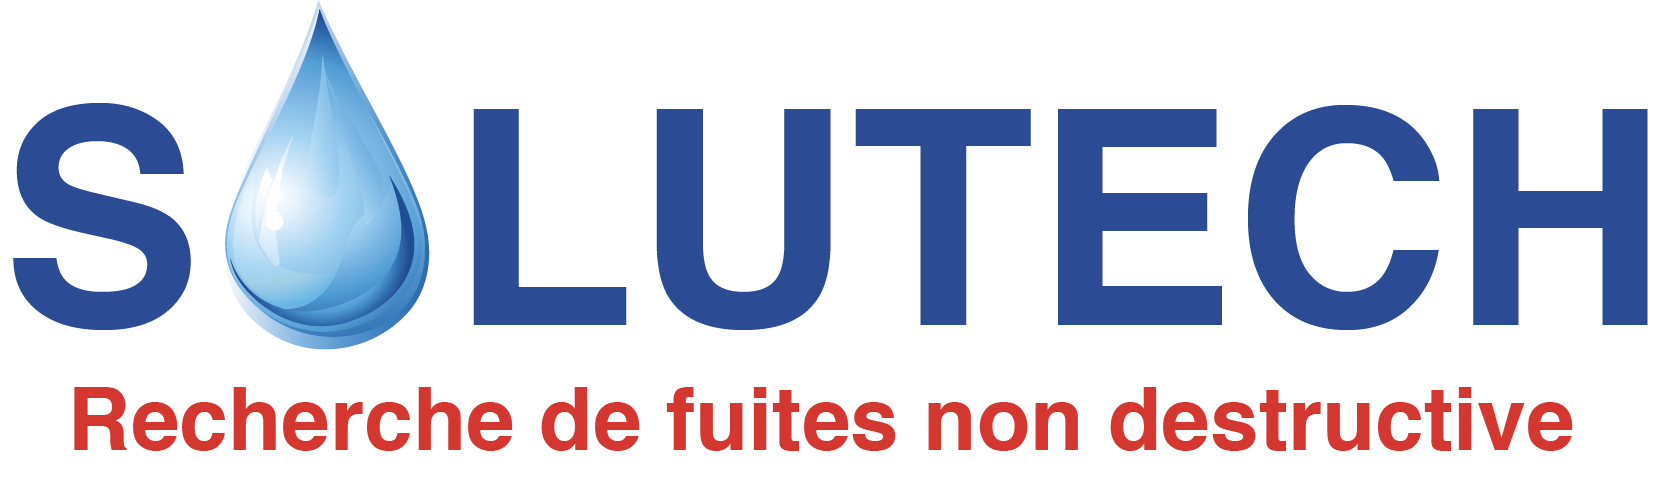 Solutech RDF Logo